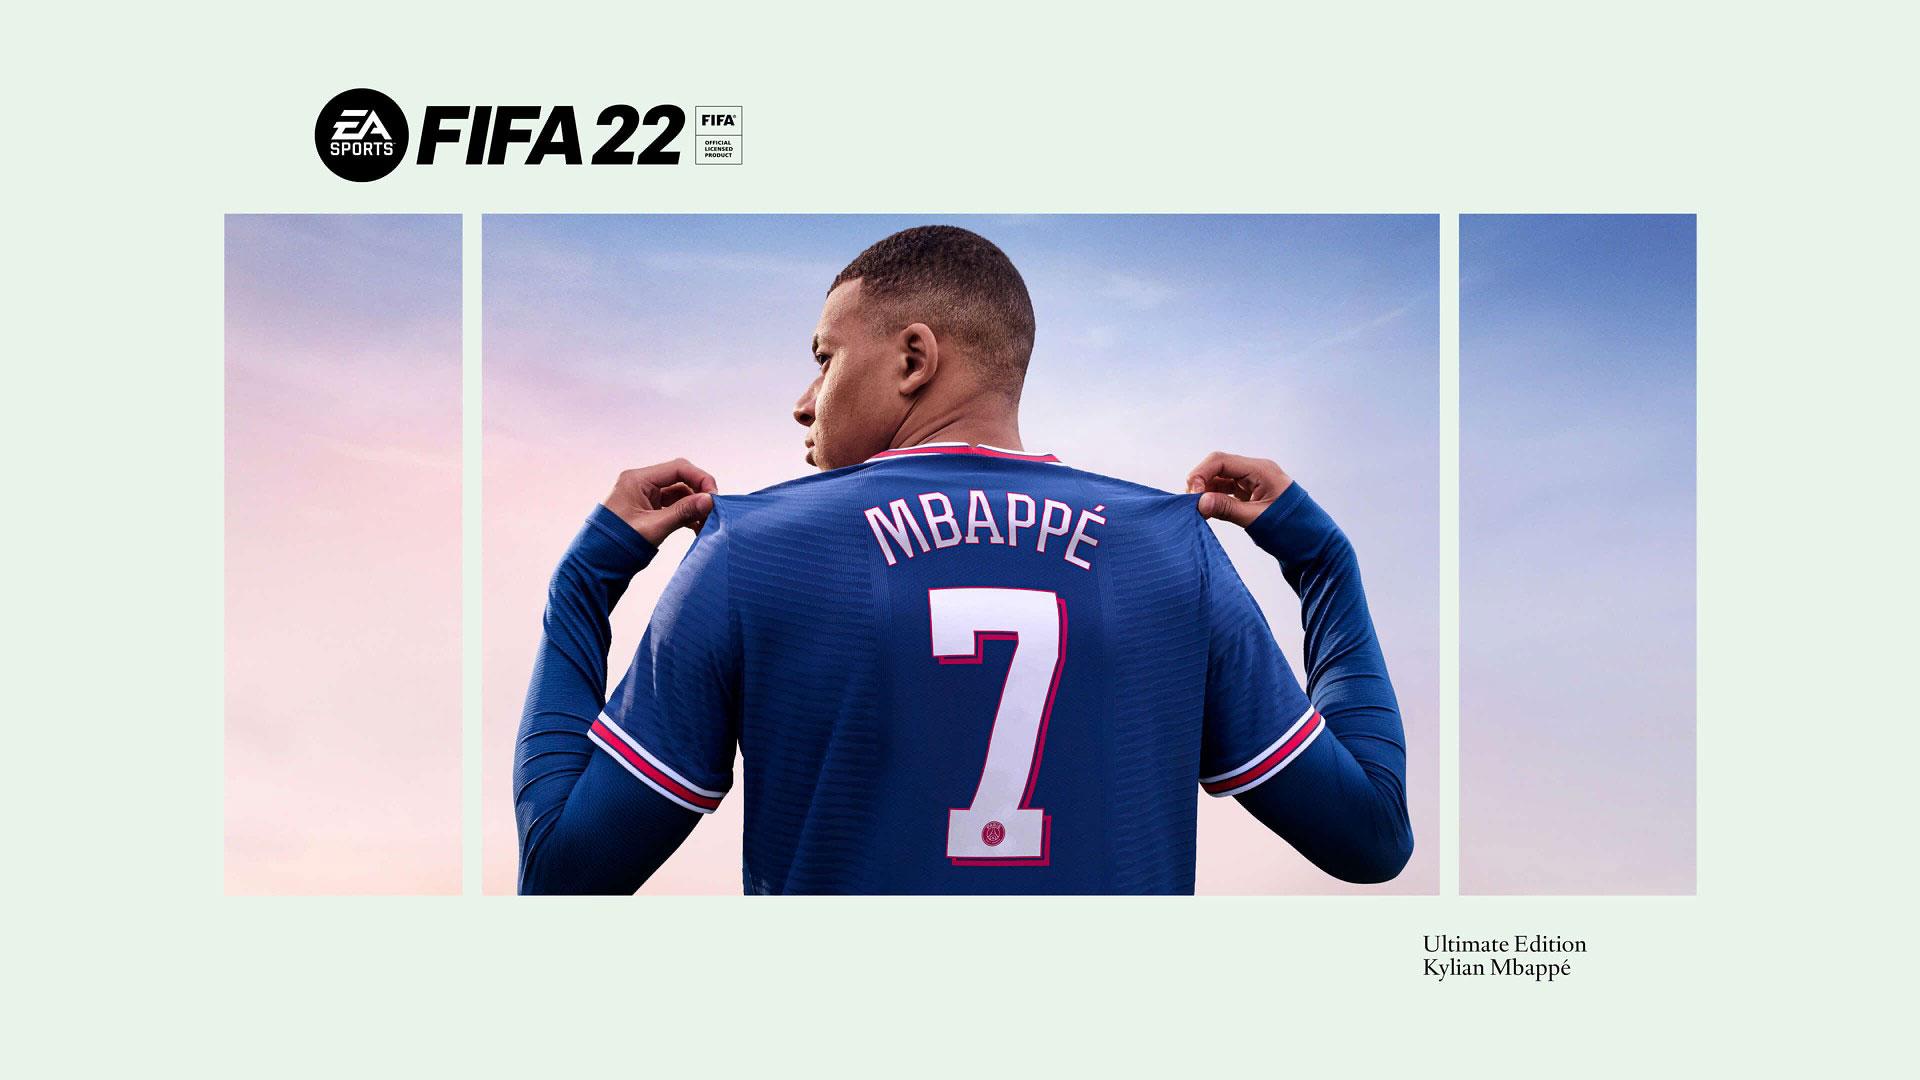 Free FIFA 22 Wallpaper in 1920x1080